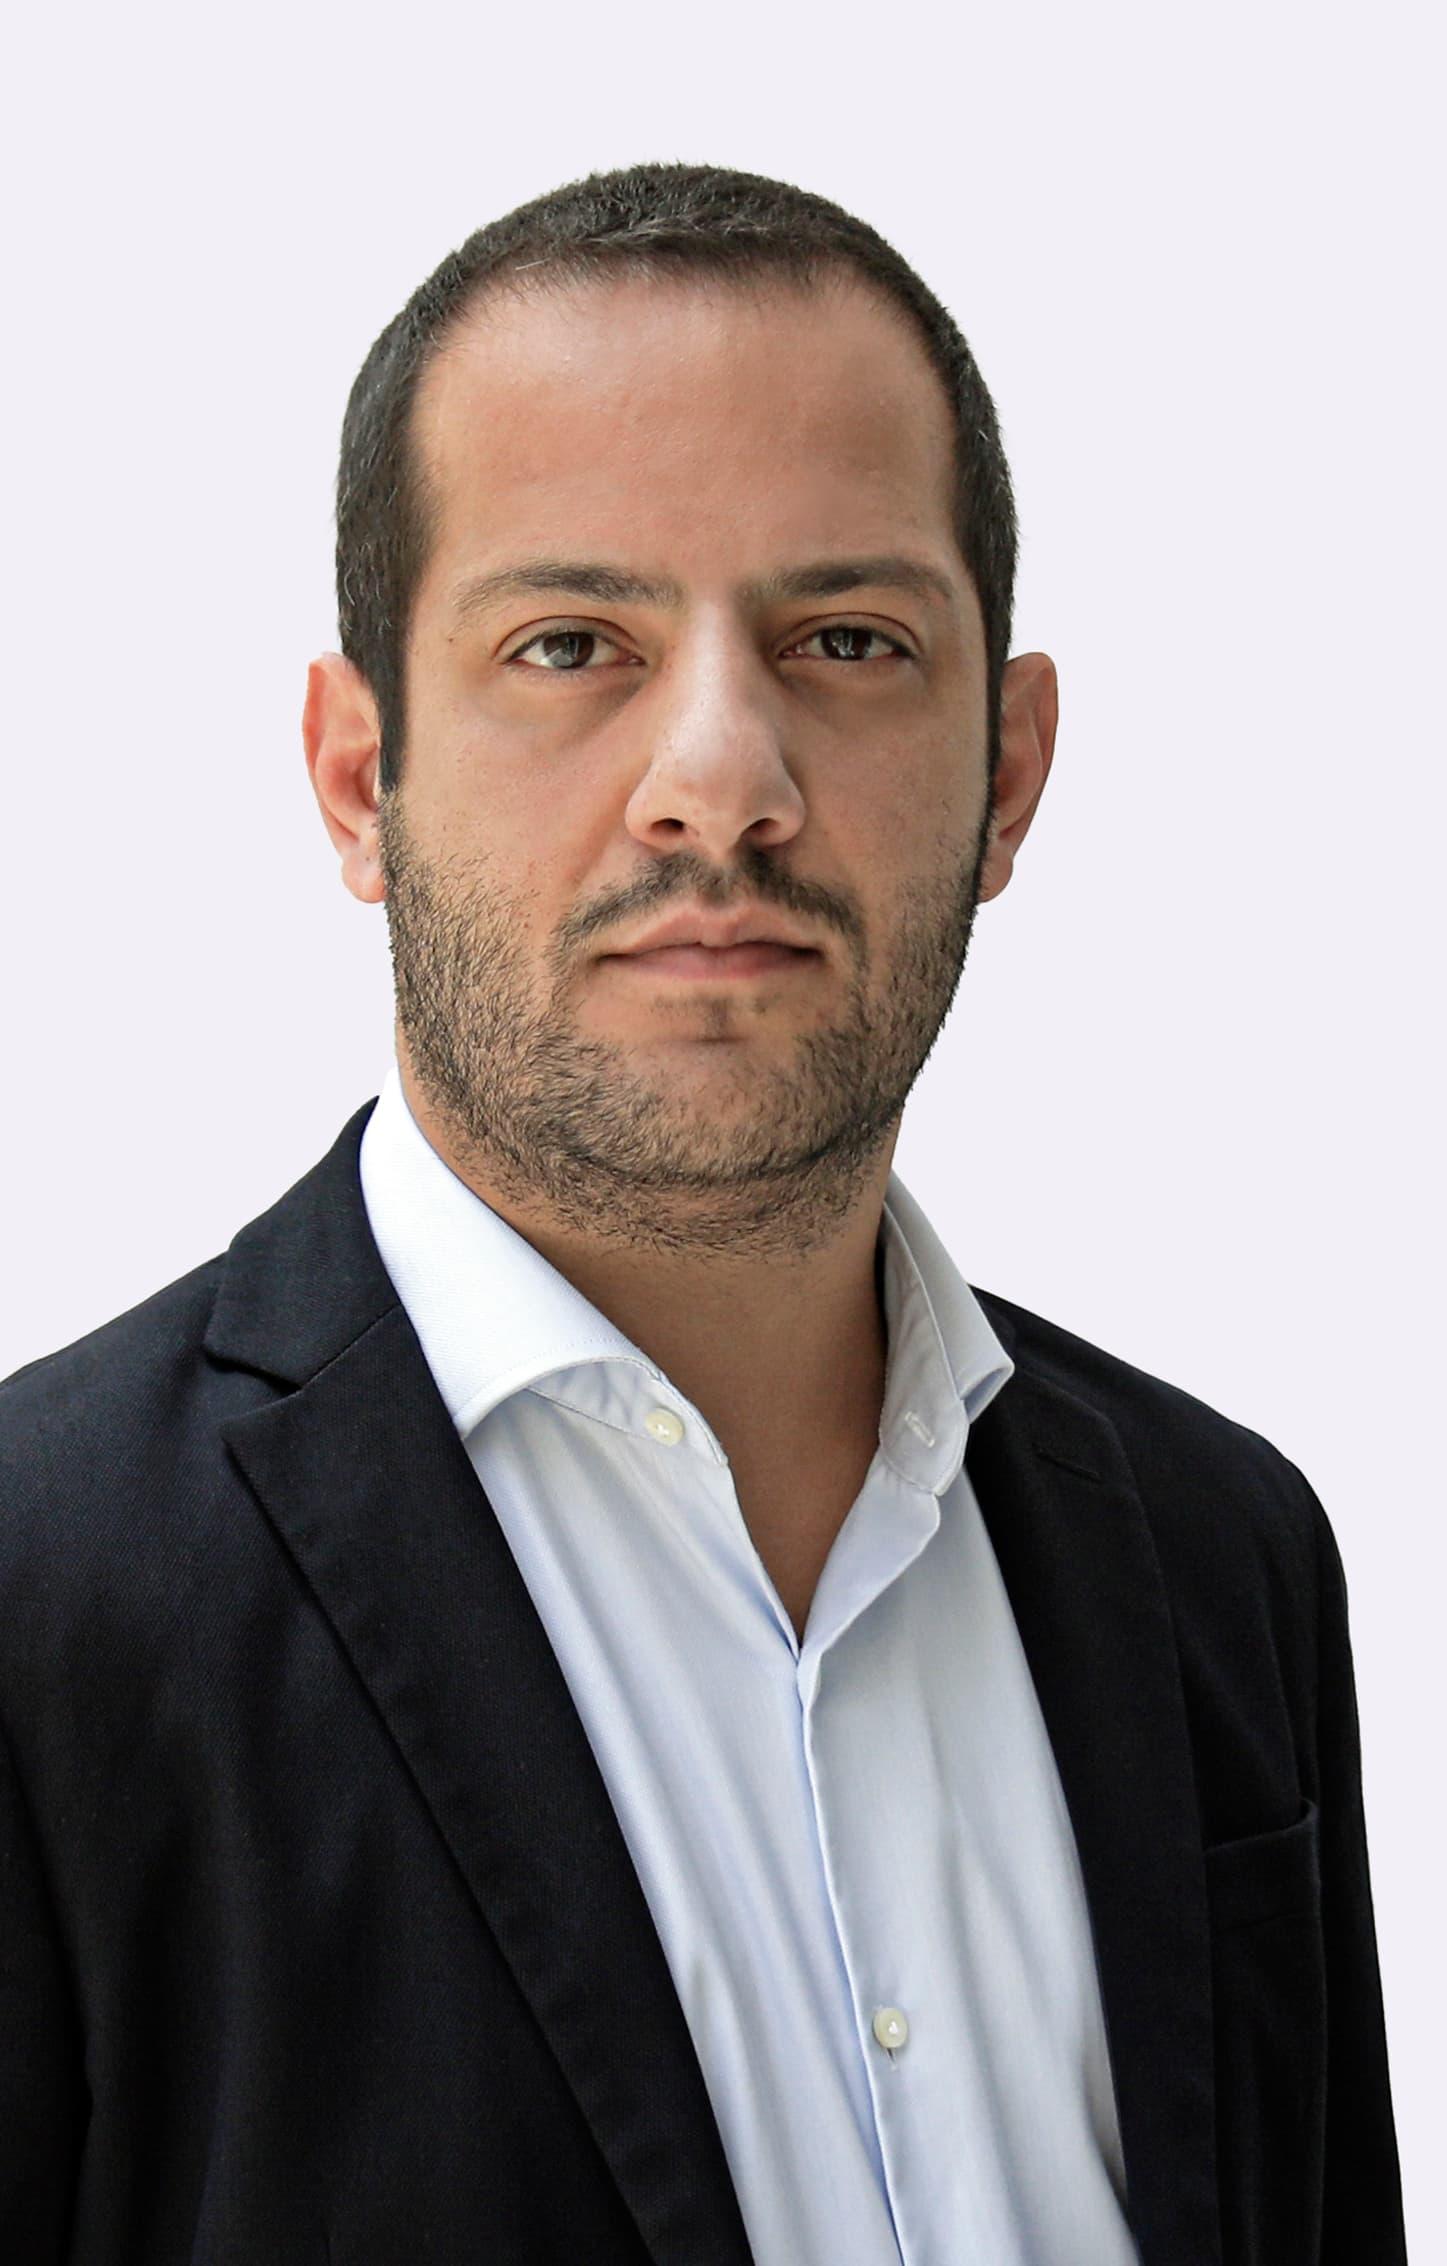 Fadi A. Mroue